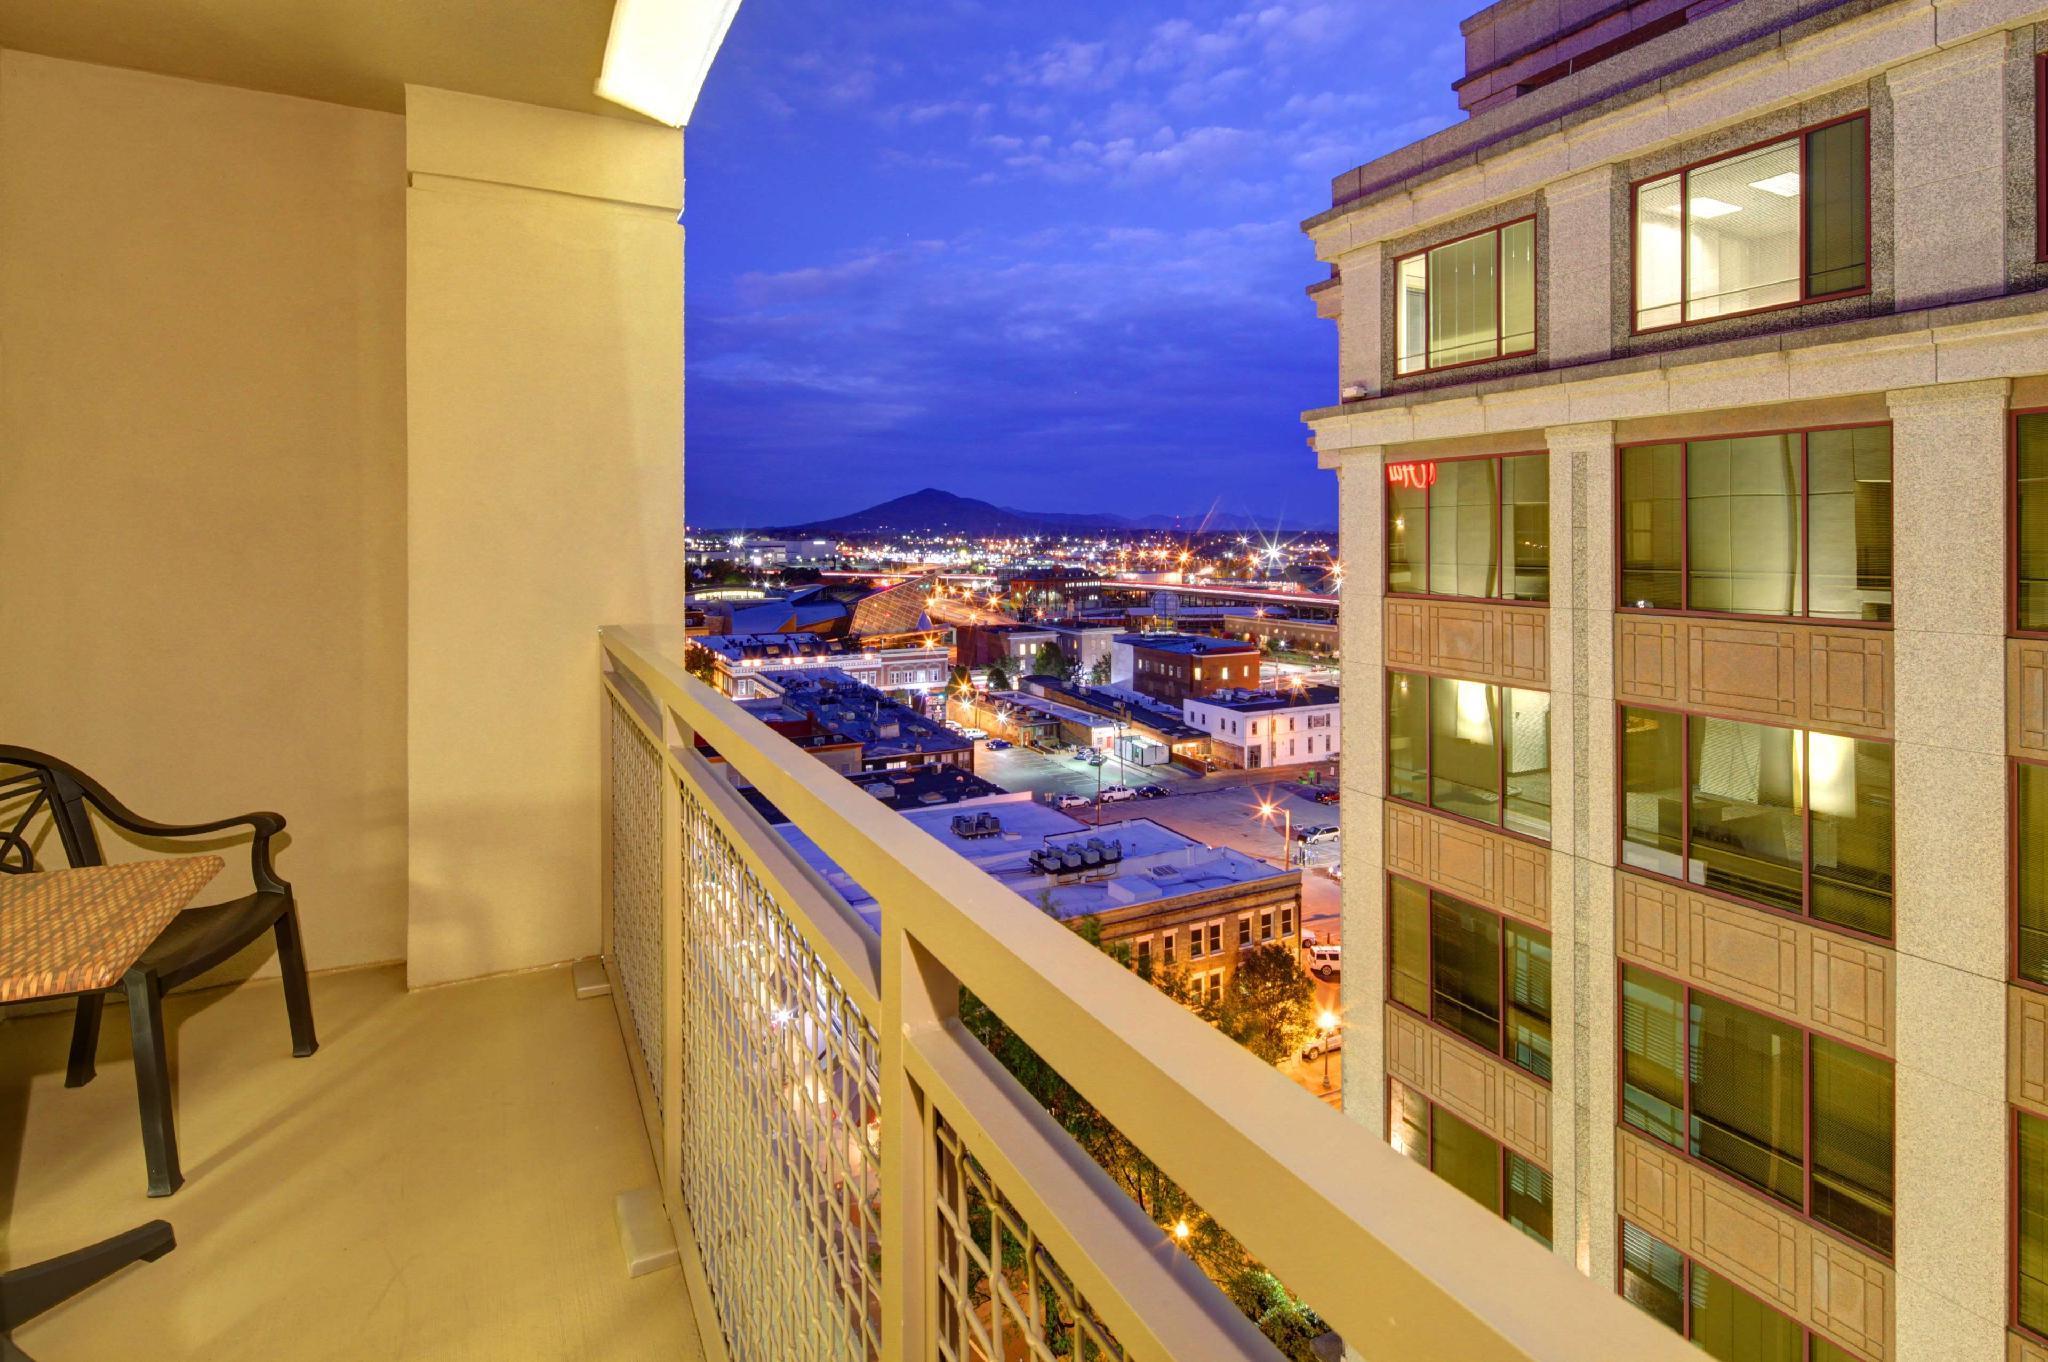 Hampton Inn and Suites Roanoke Downtown, Roanoke City